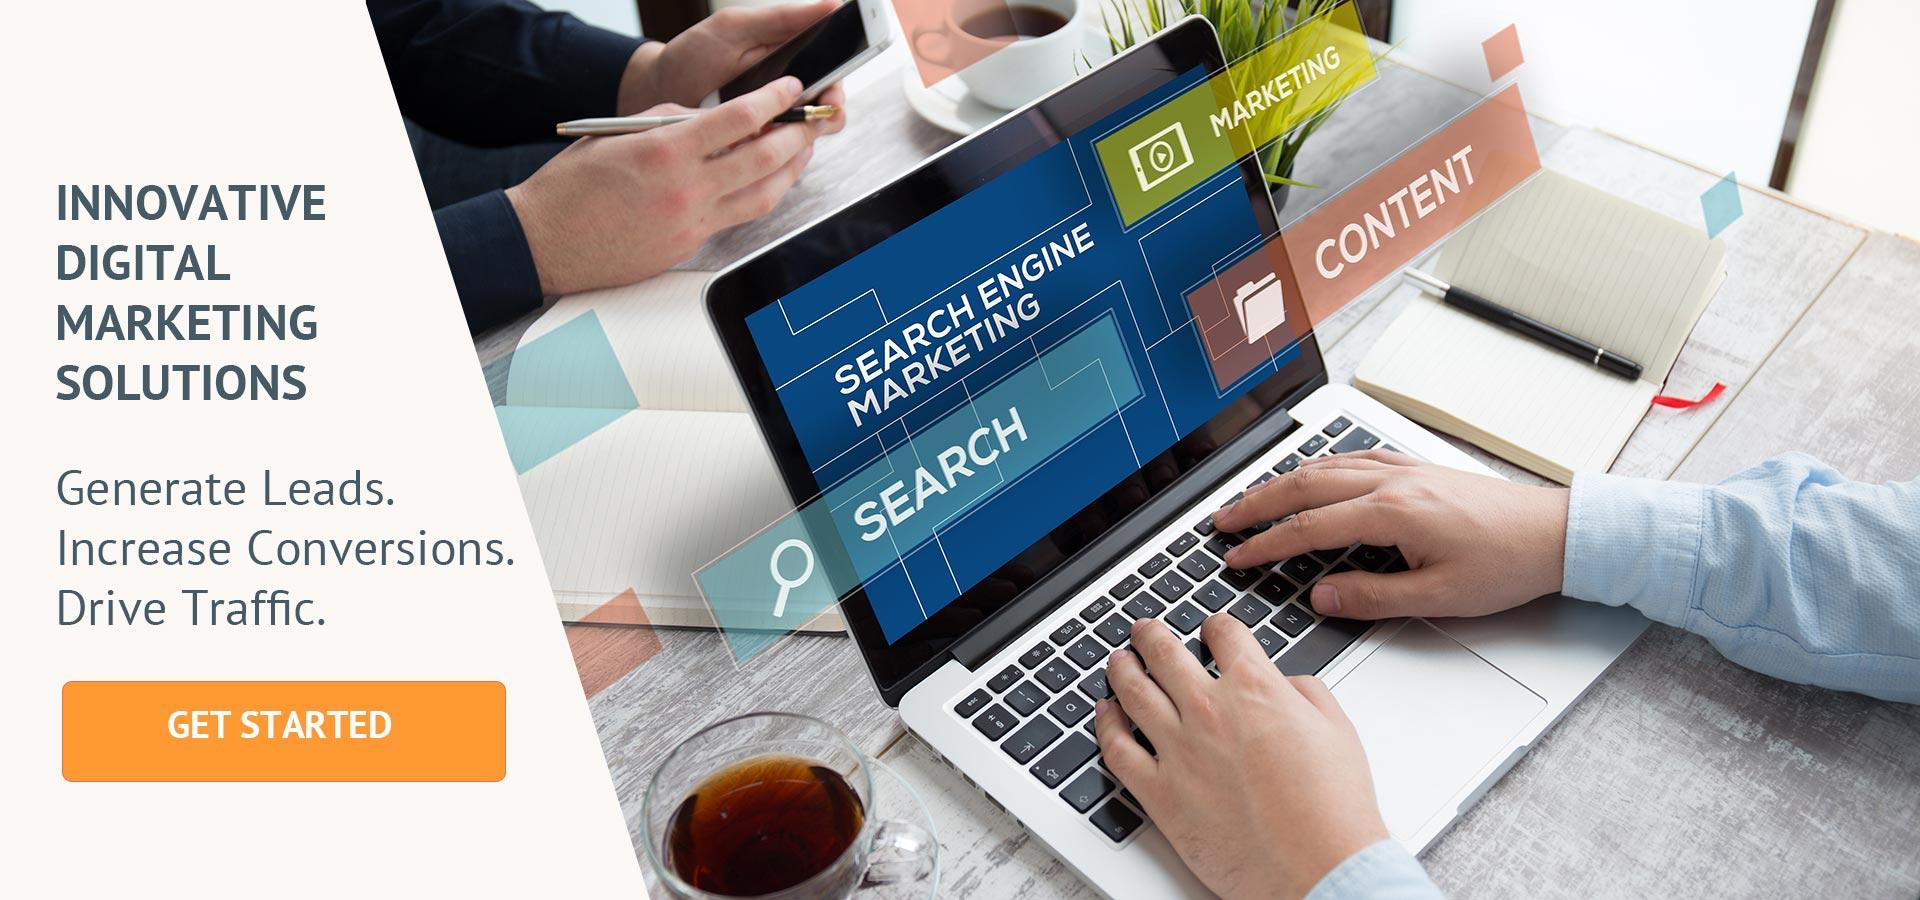 Digital Marketing and Web Design, Plano, TX